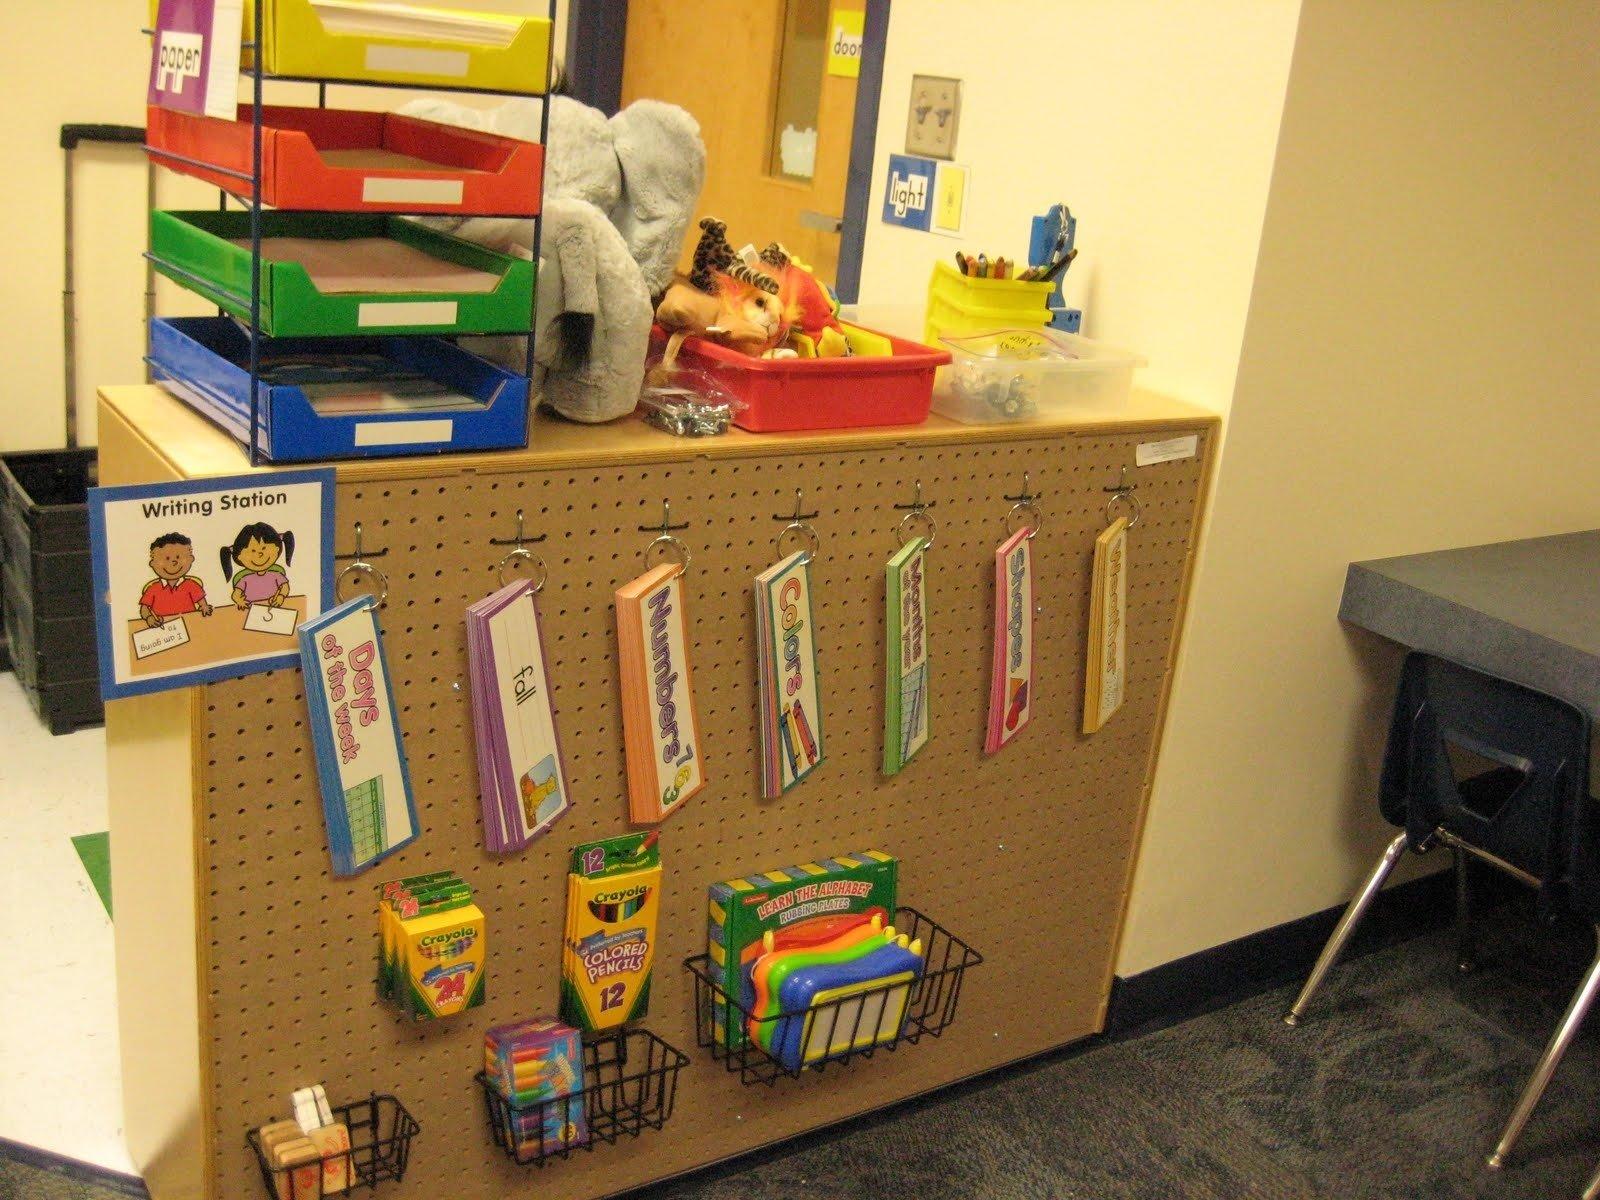 10 Best Writing Center Ideas For Preschool images about teacher on pinterest sight words kindergarten and 2020